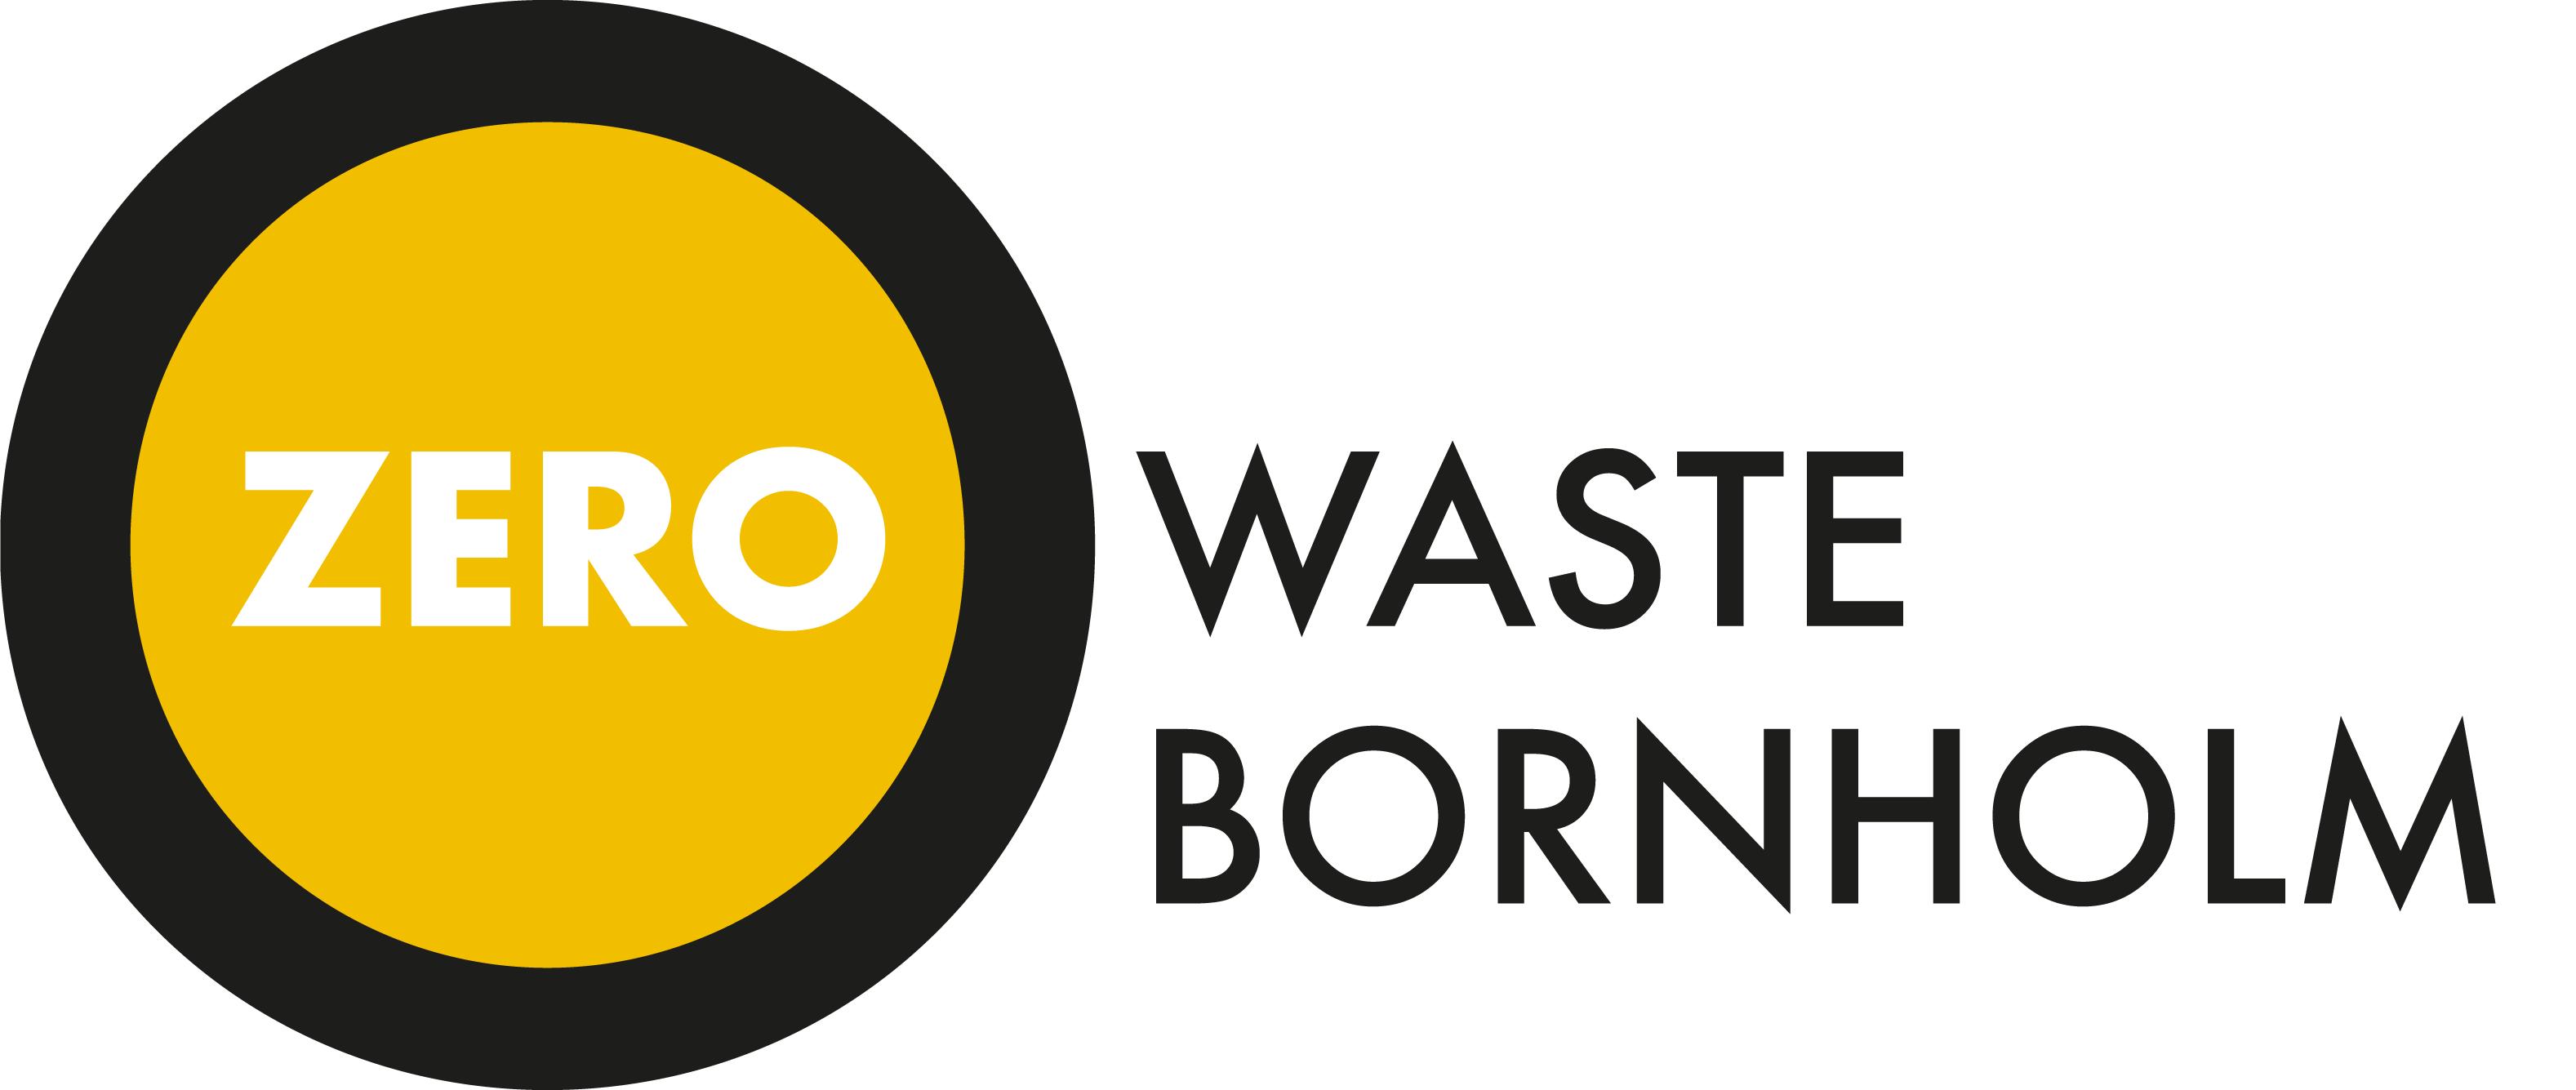 Zero Waste Bornholm